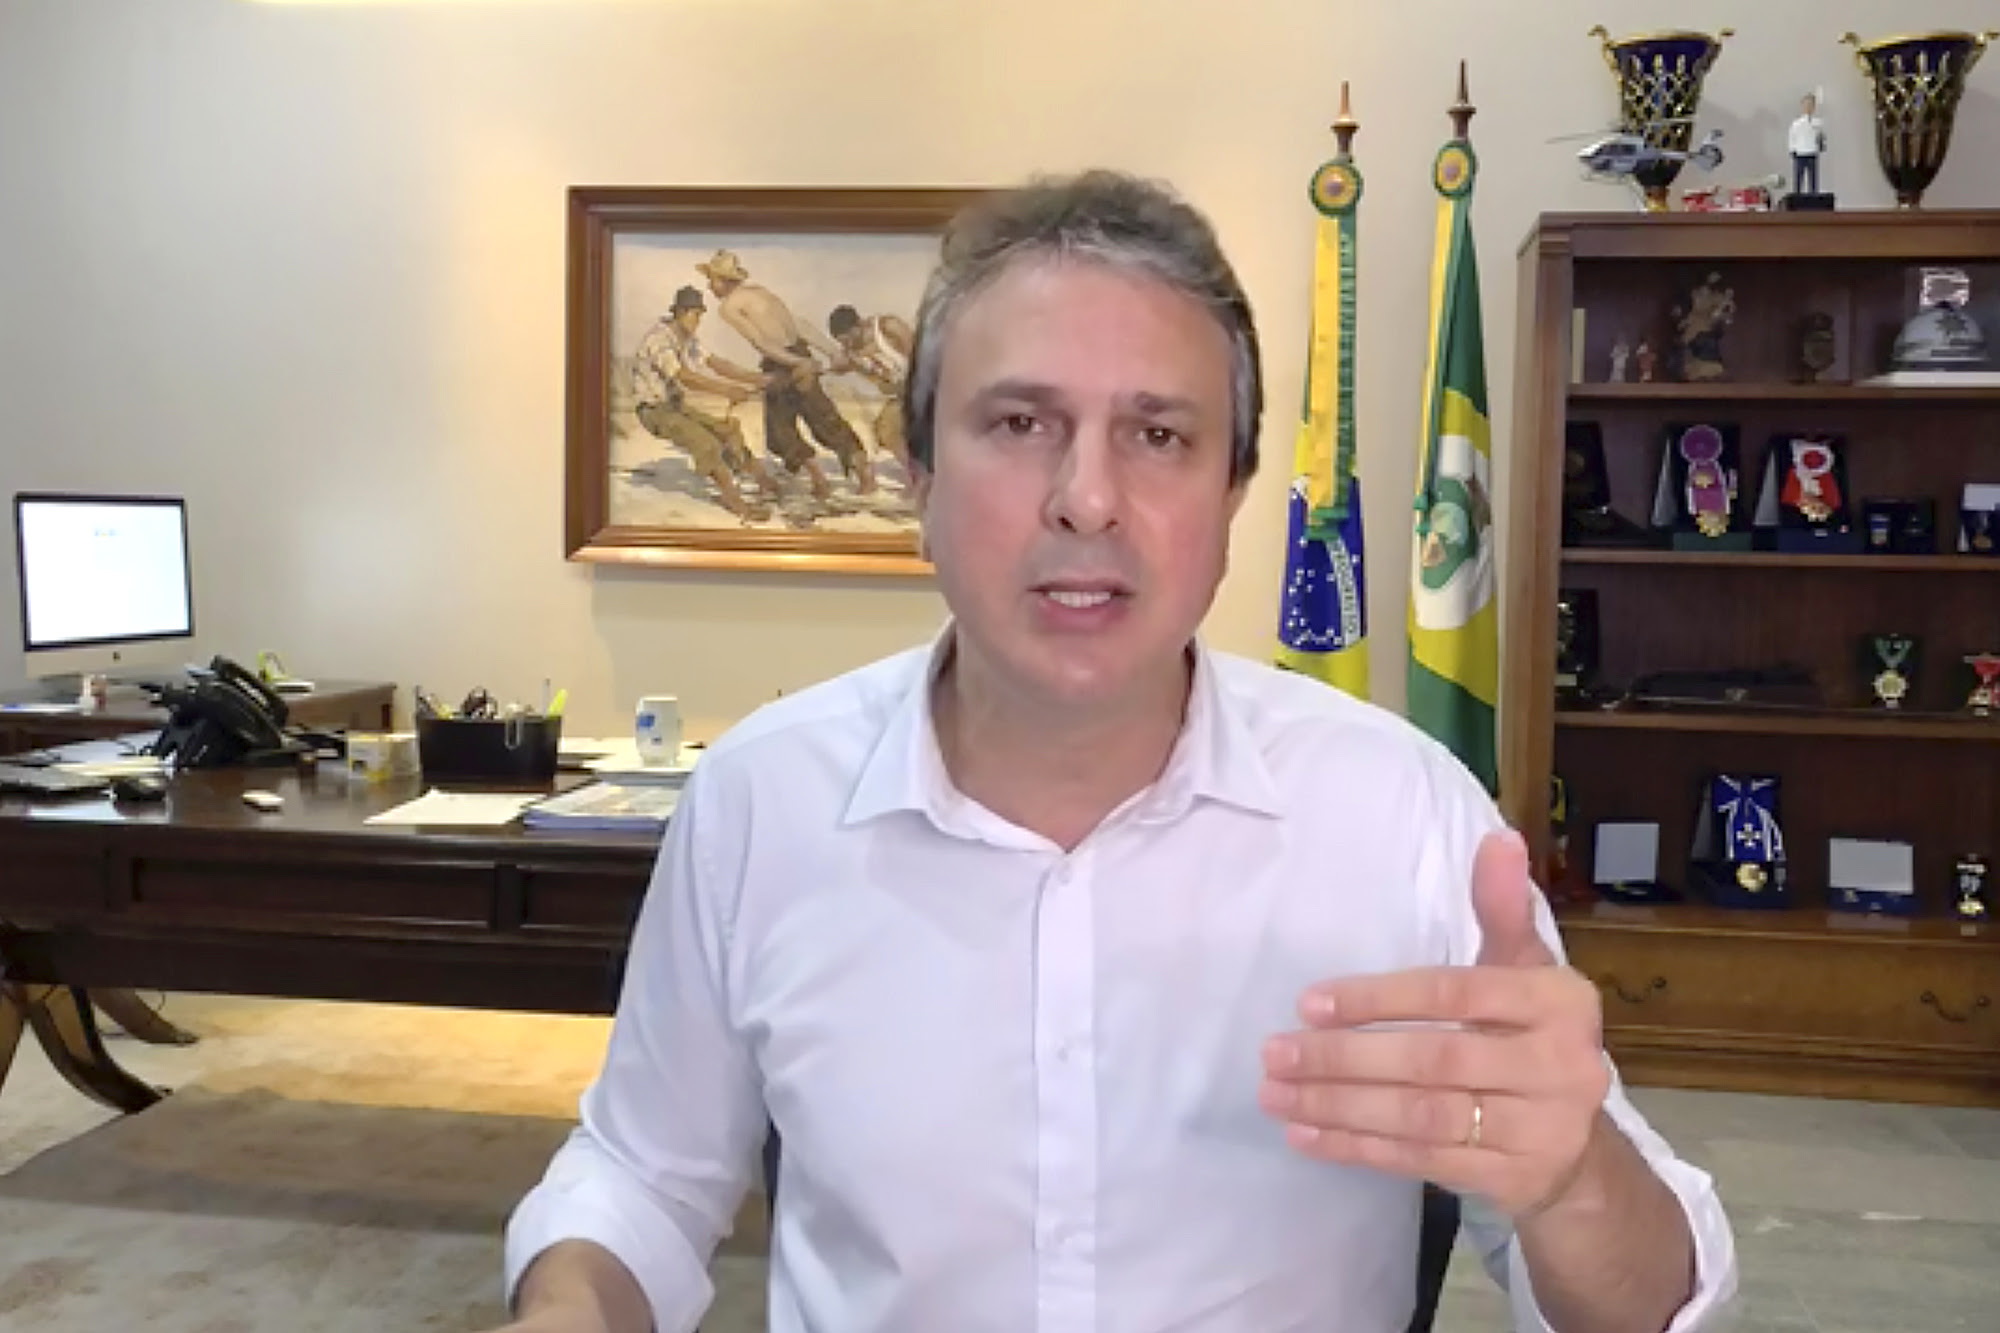 Governo do Ceará amplia leitos exclusivos para tratamento de coronavírus em 34 municípios cearenses